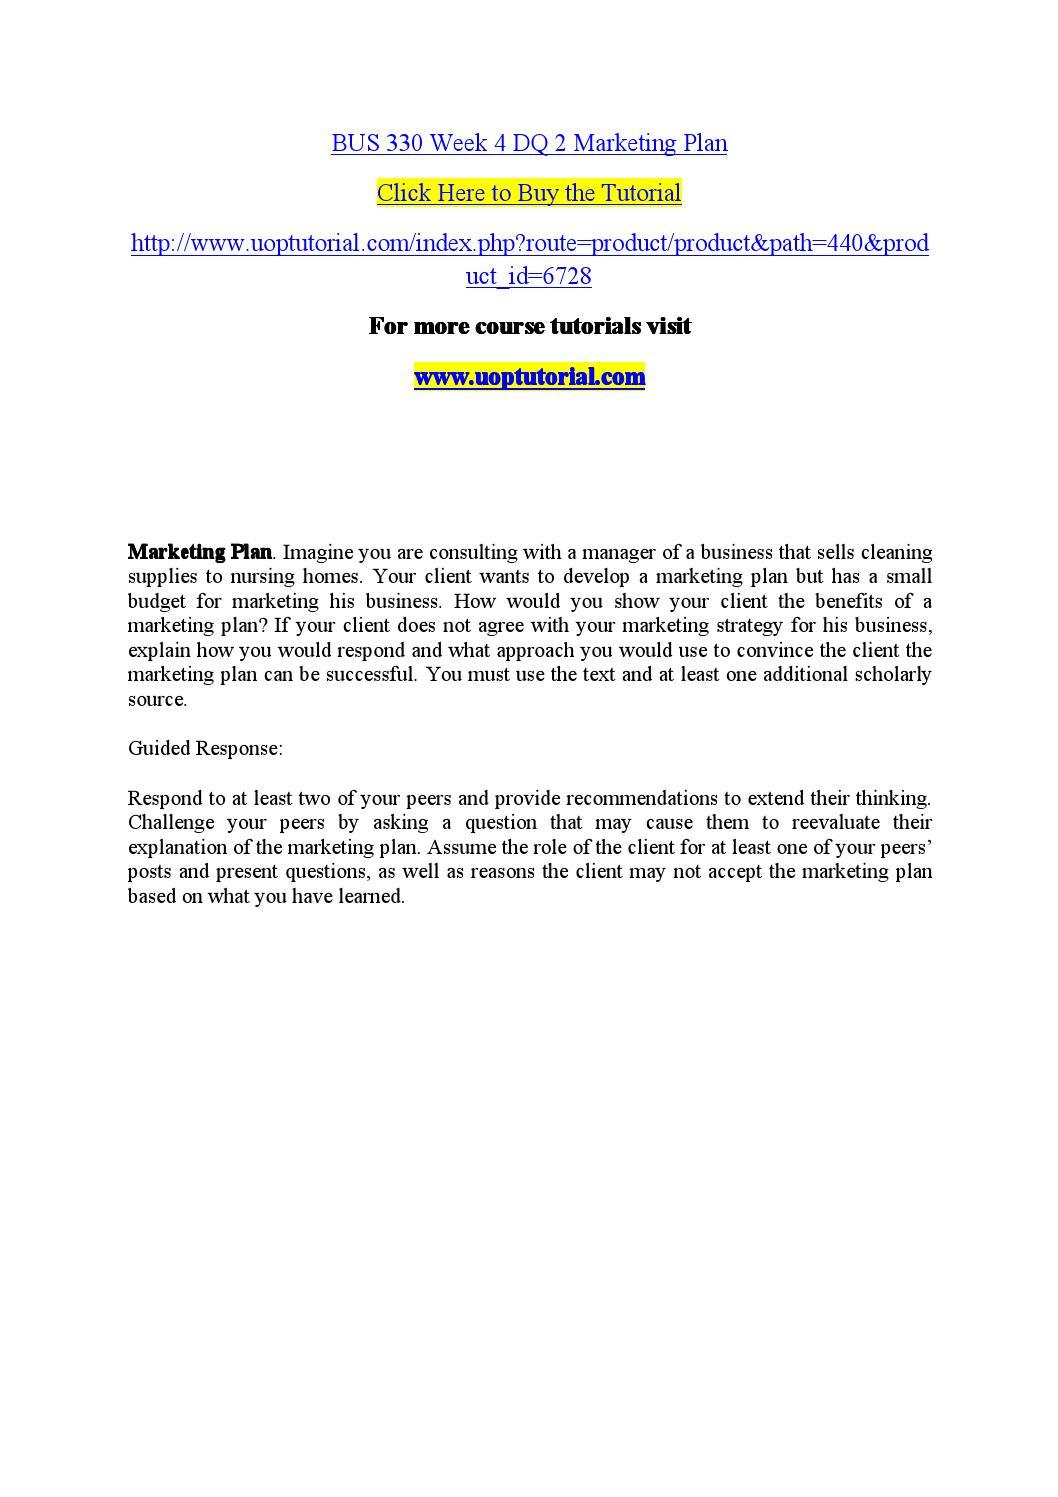 BUS 330 Principles of Marketing: Ashford